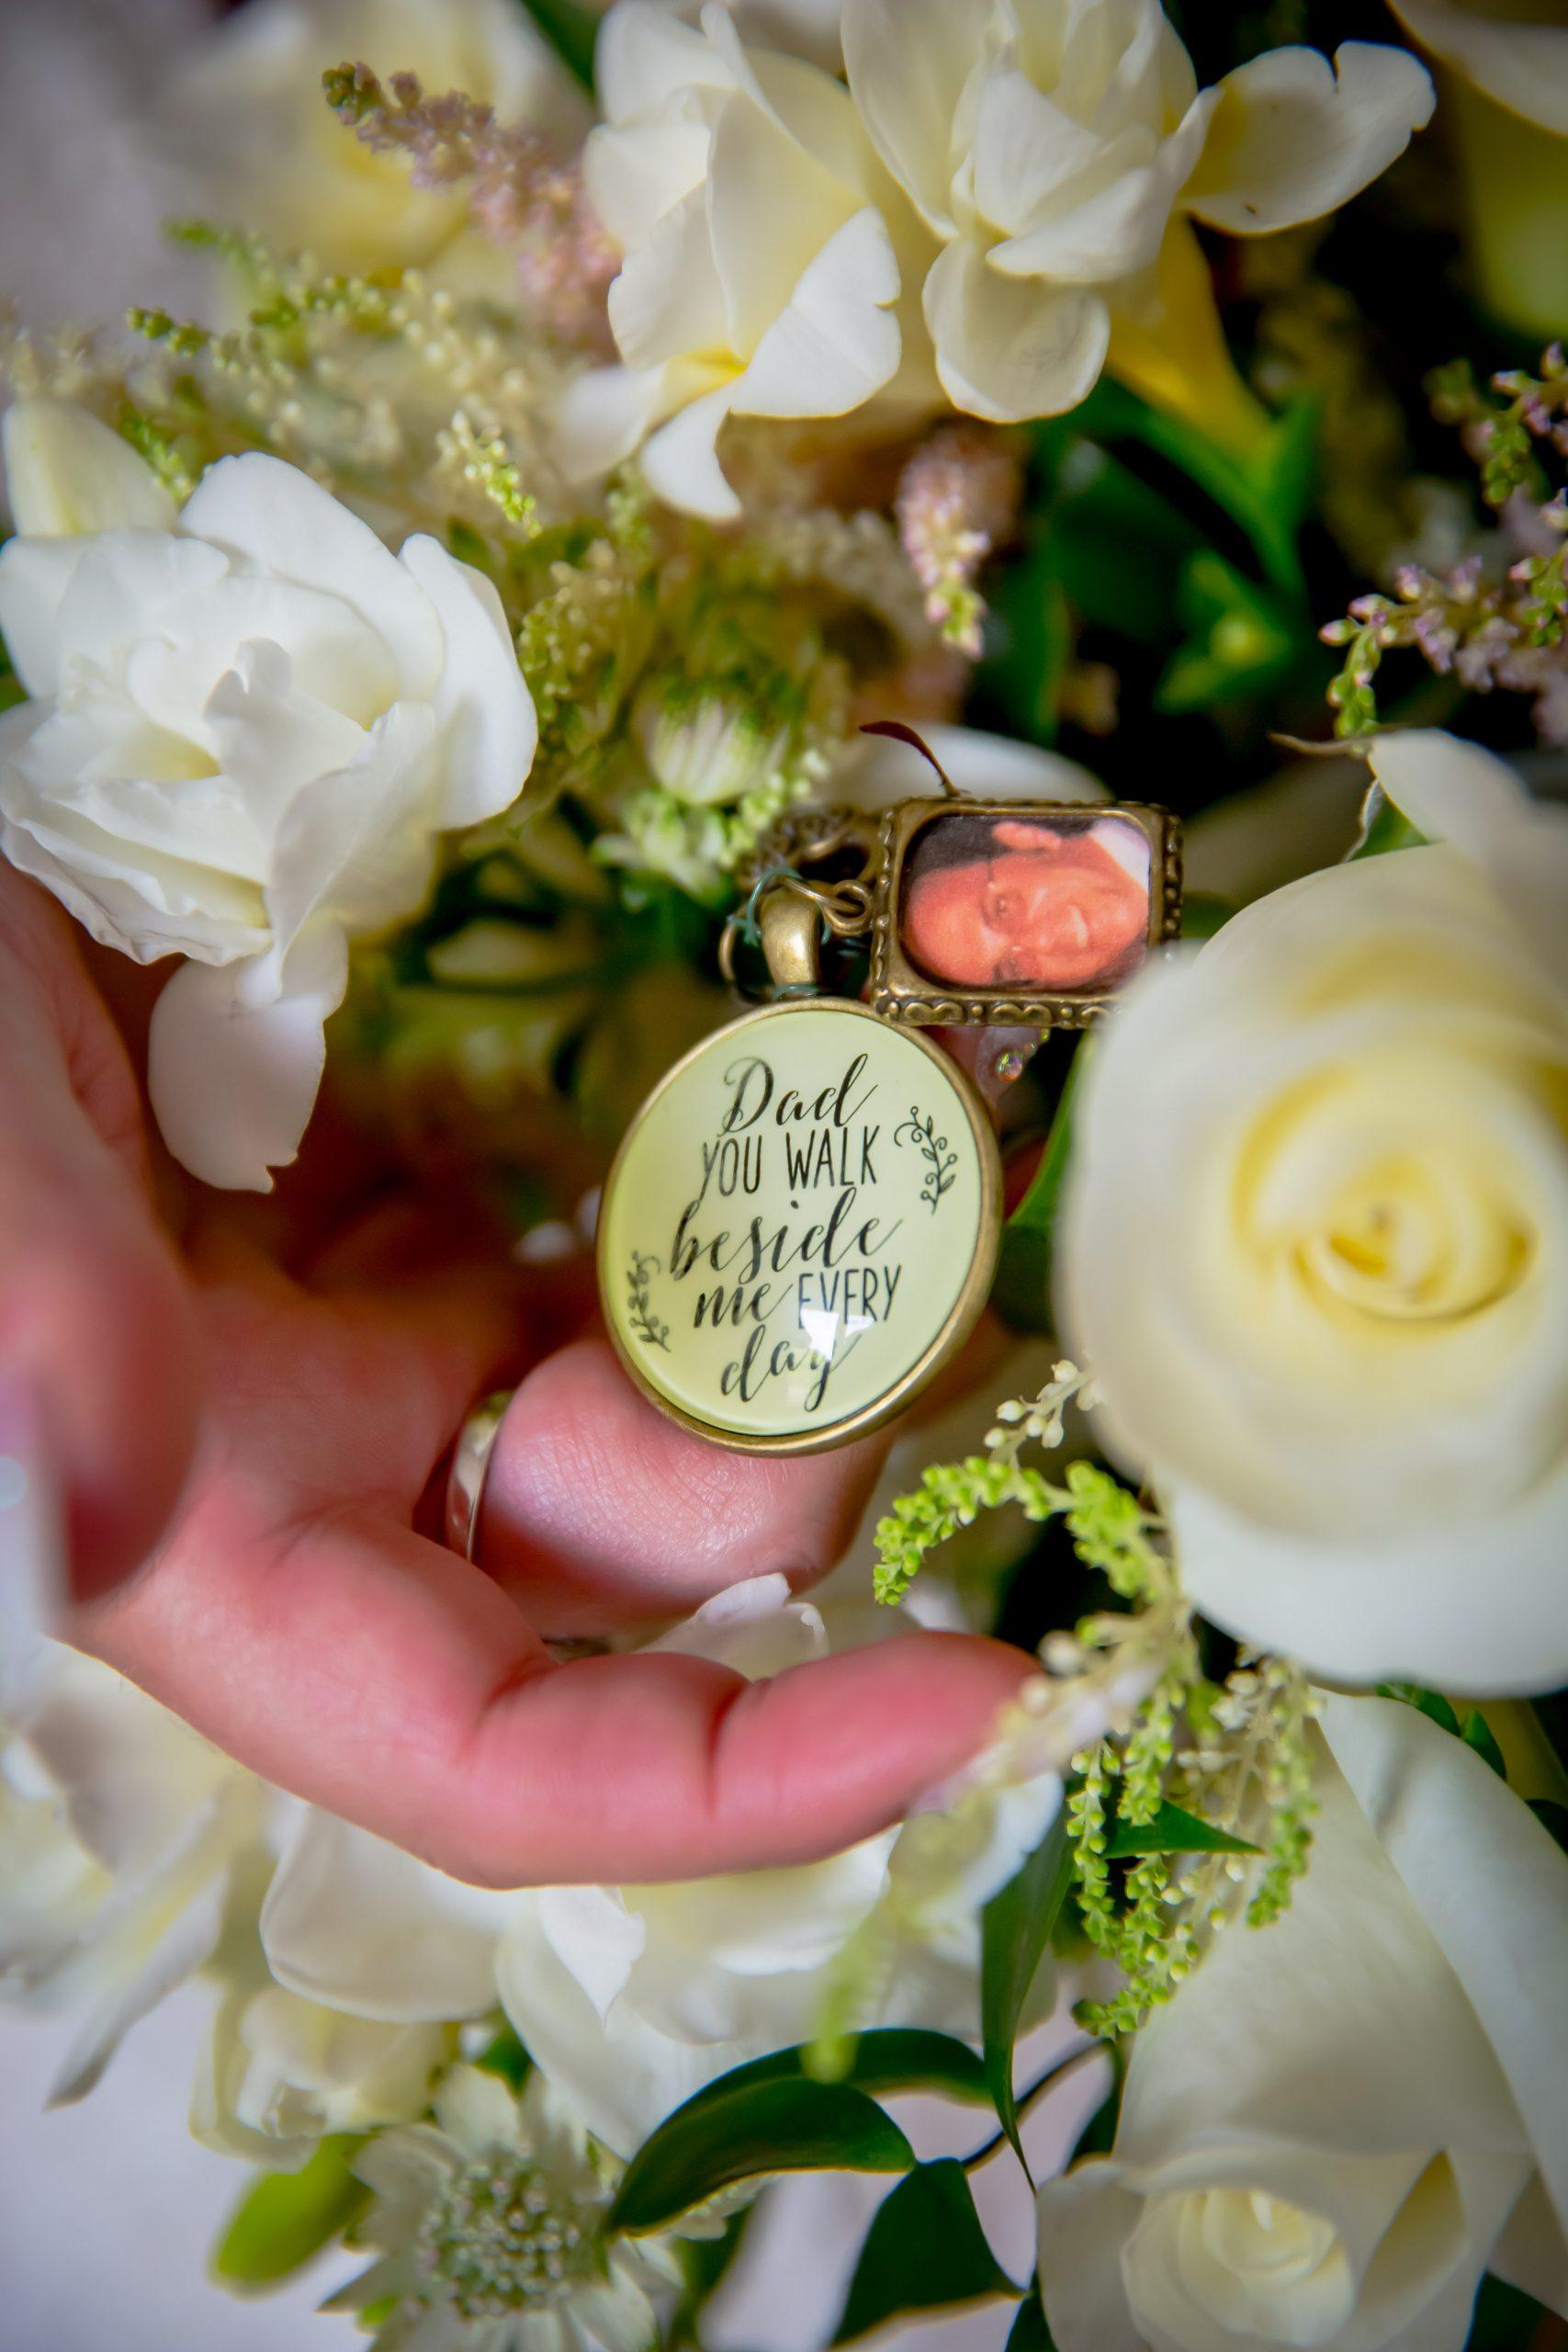 Victori_Rob_Mohawk River Country Club Wedding-24.jpg